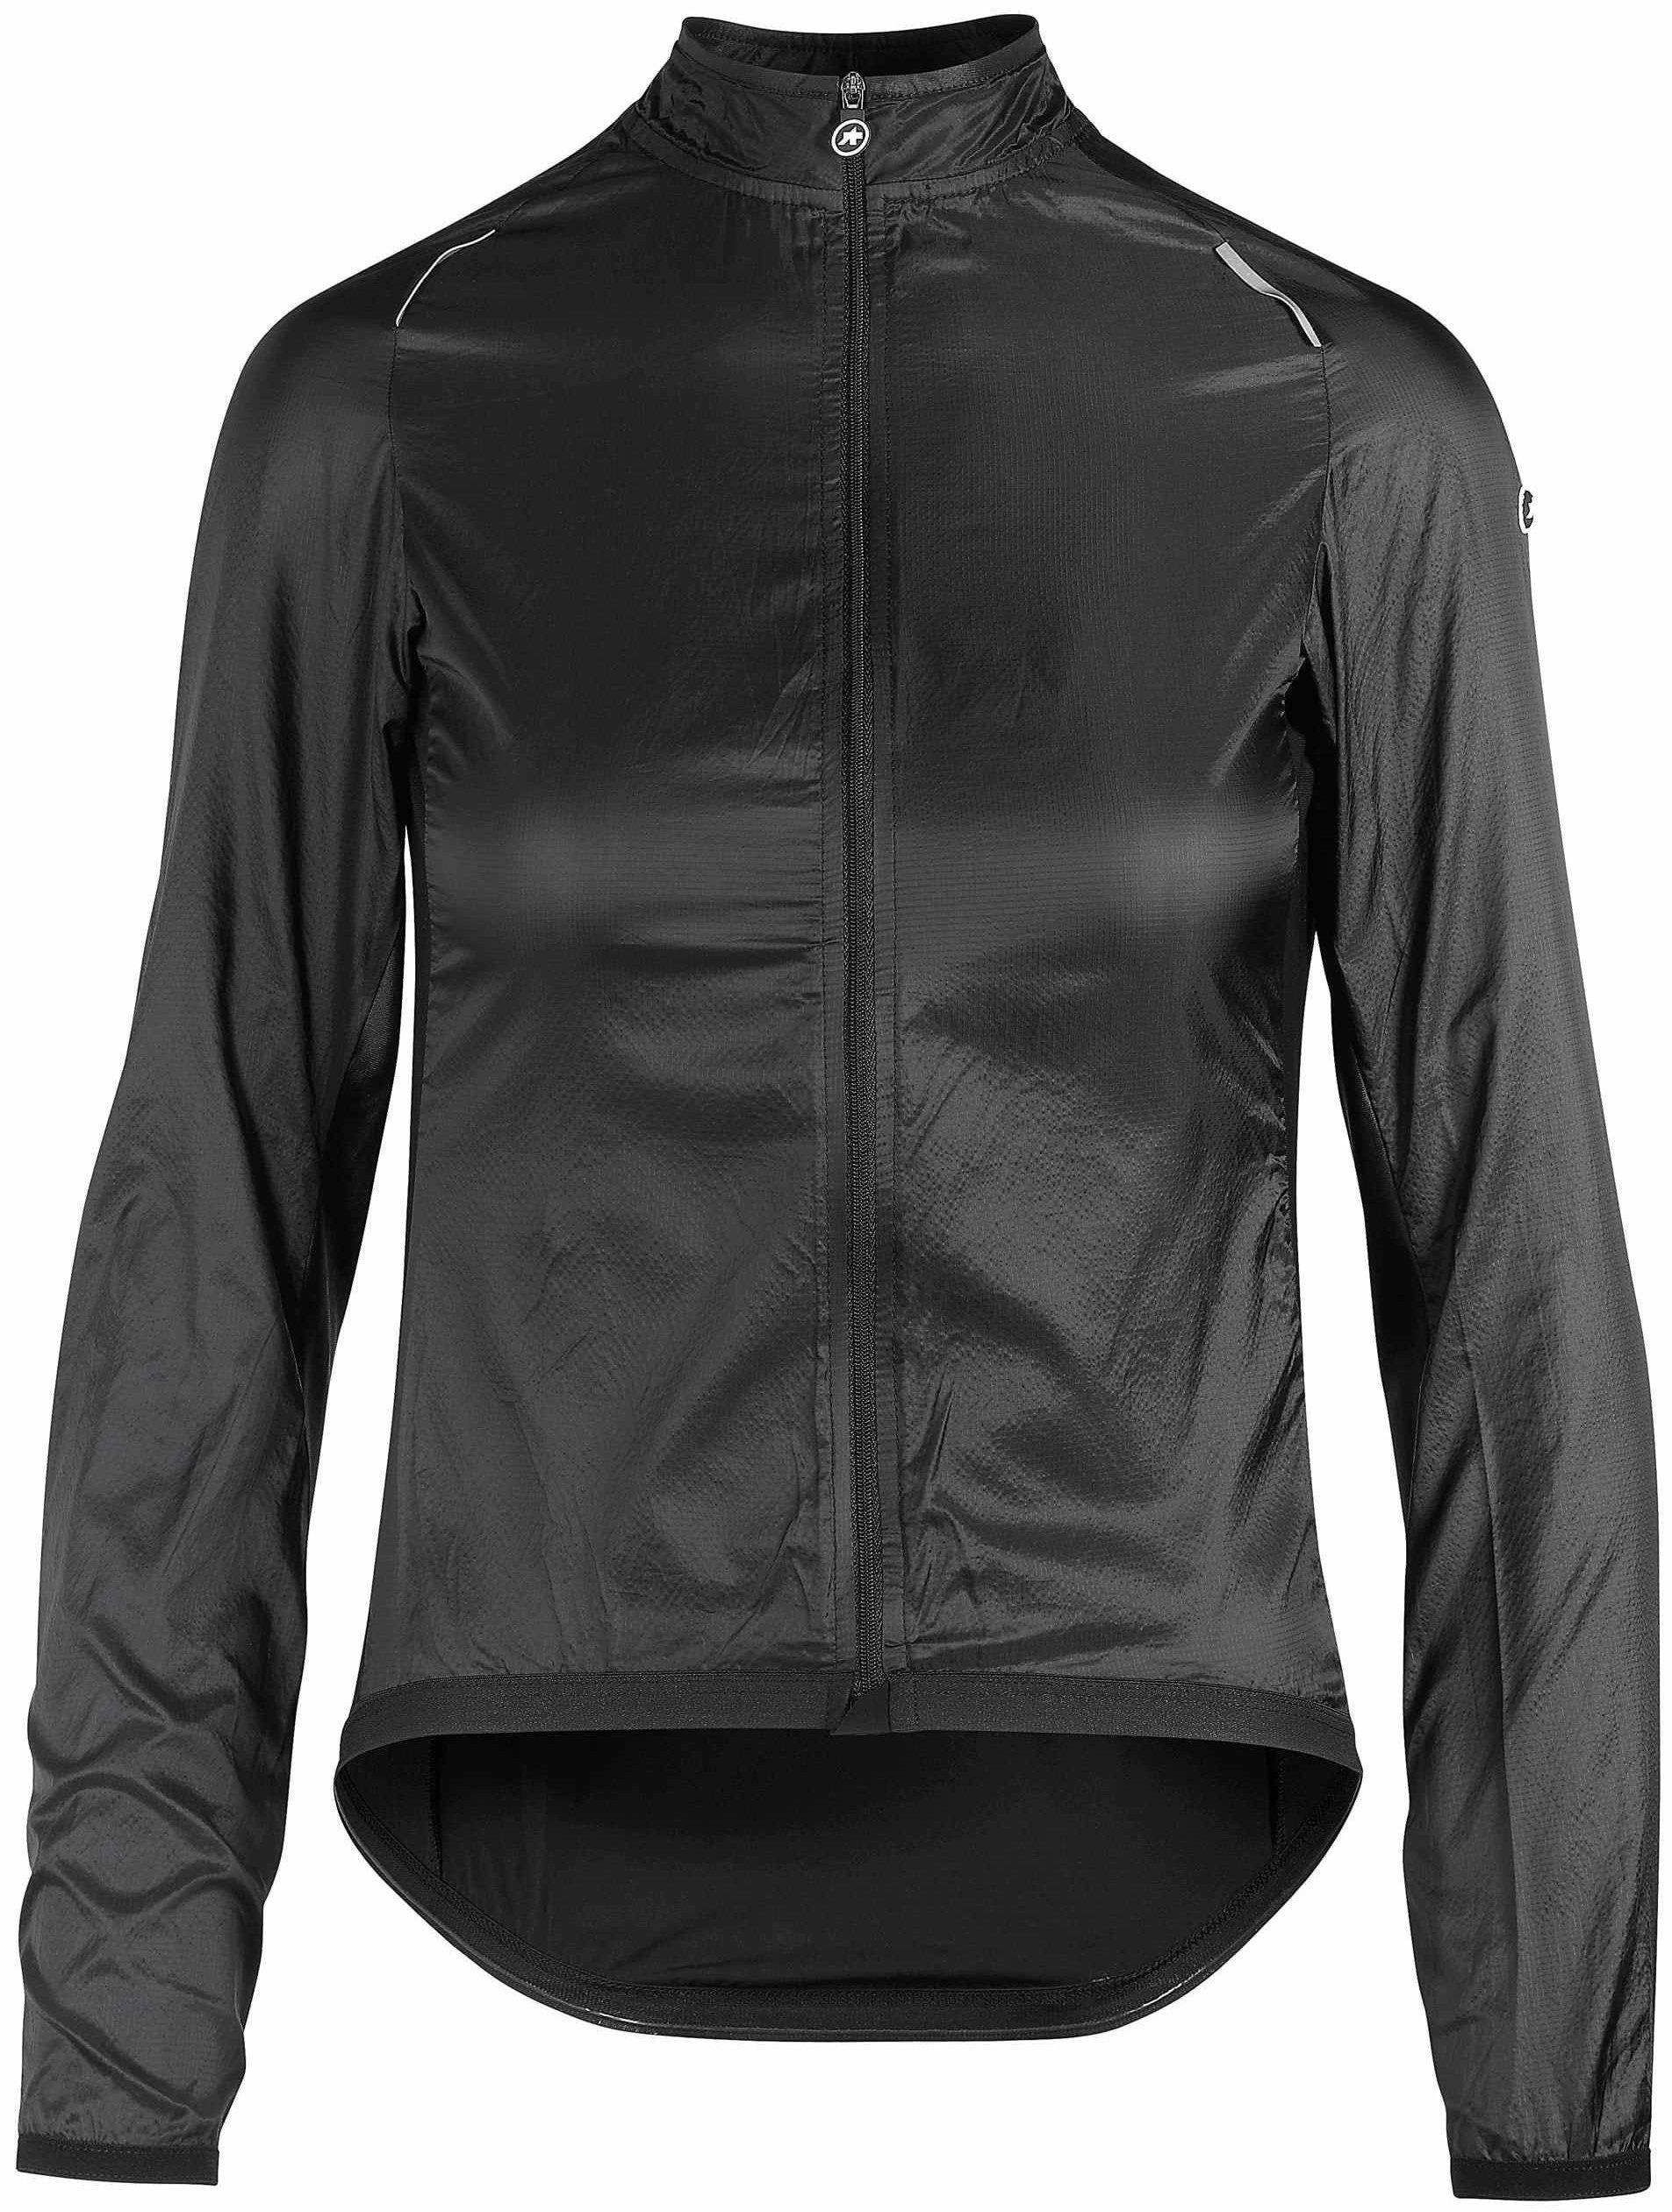 Assos UMA GT Wind Jacket Summer Dame Vindjakke - Sort